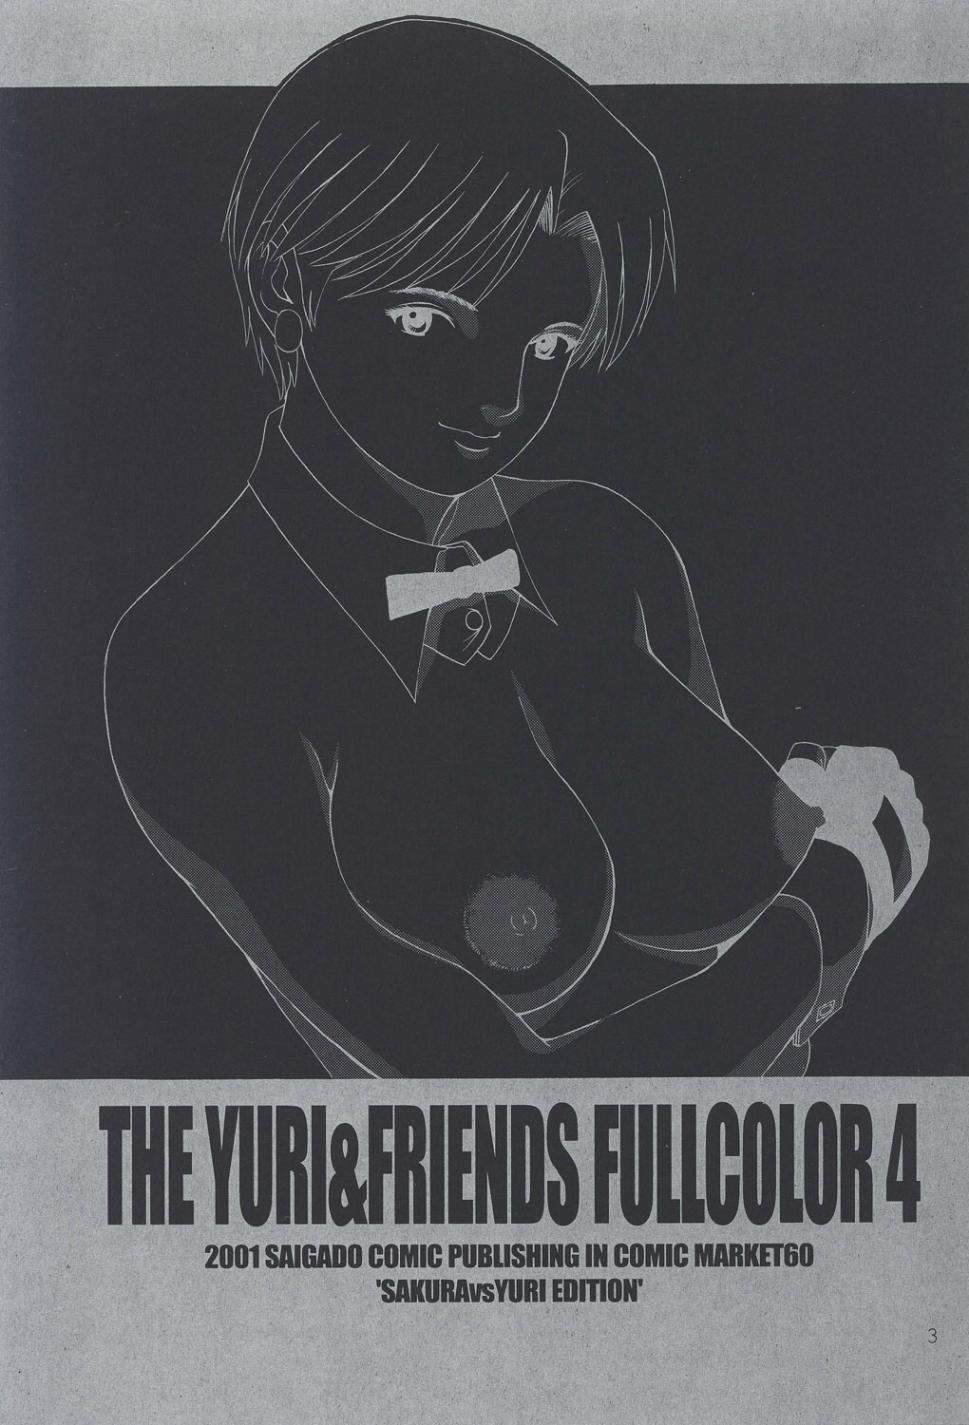 The Yuri & Friends Fullcolor 4 SAKURA vs. YURI EDITION 1